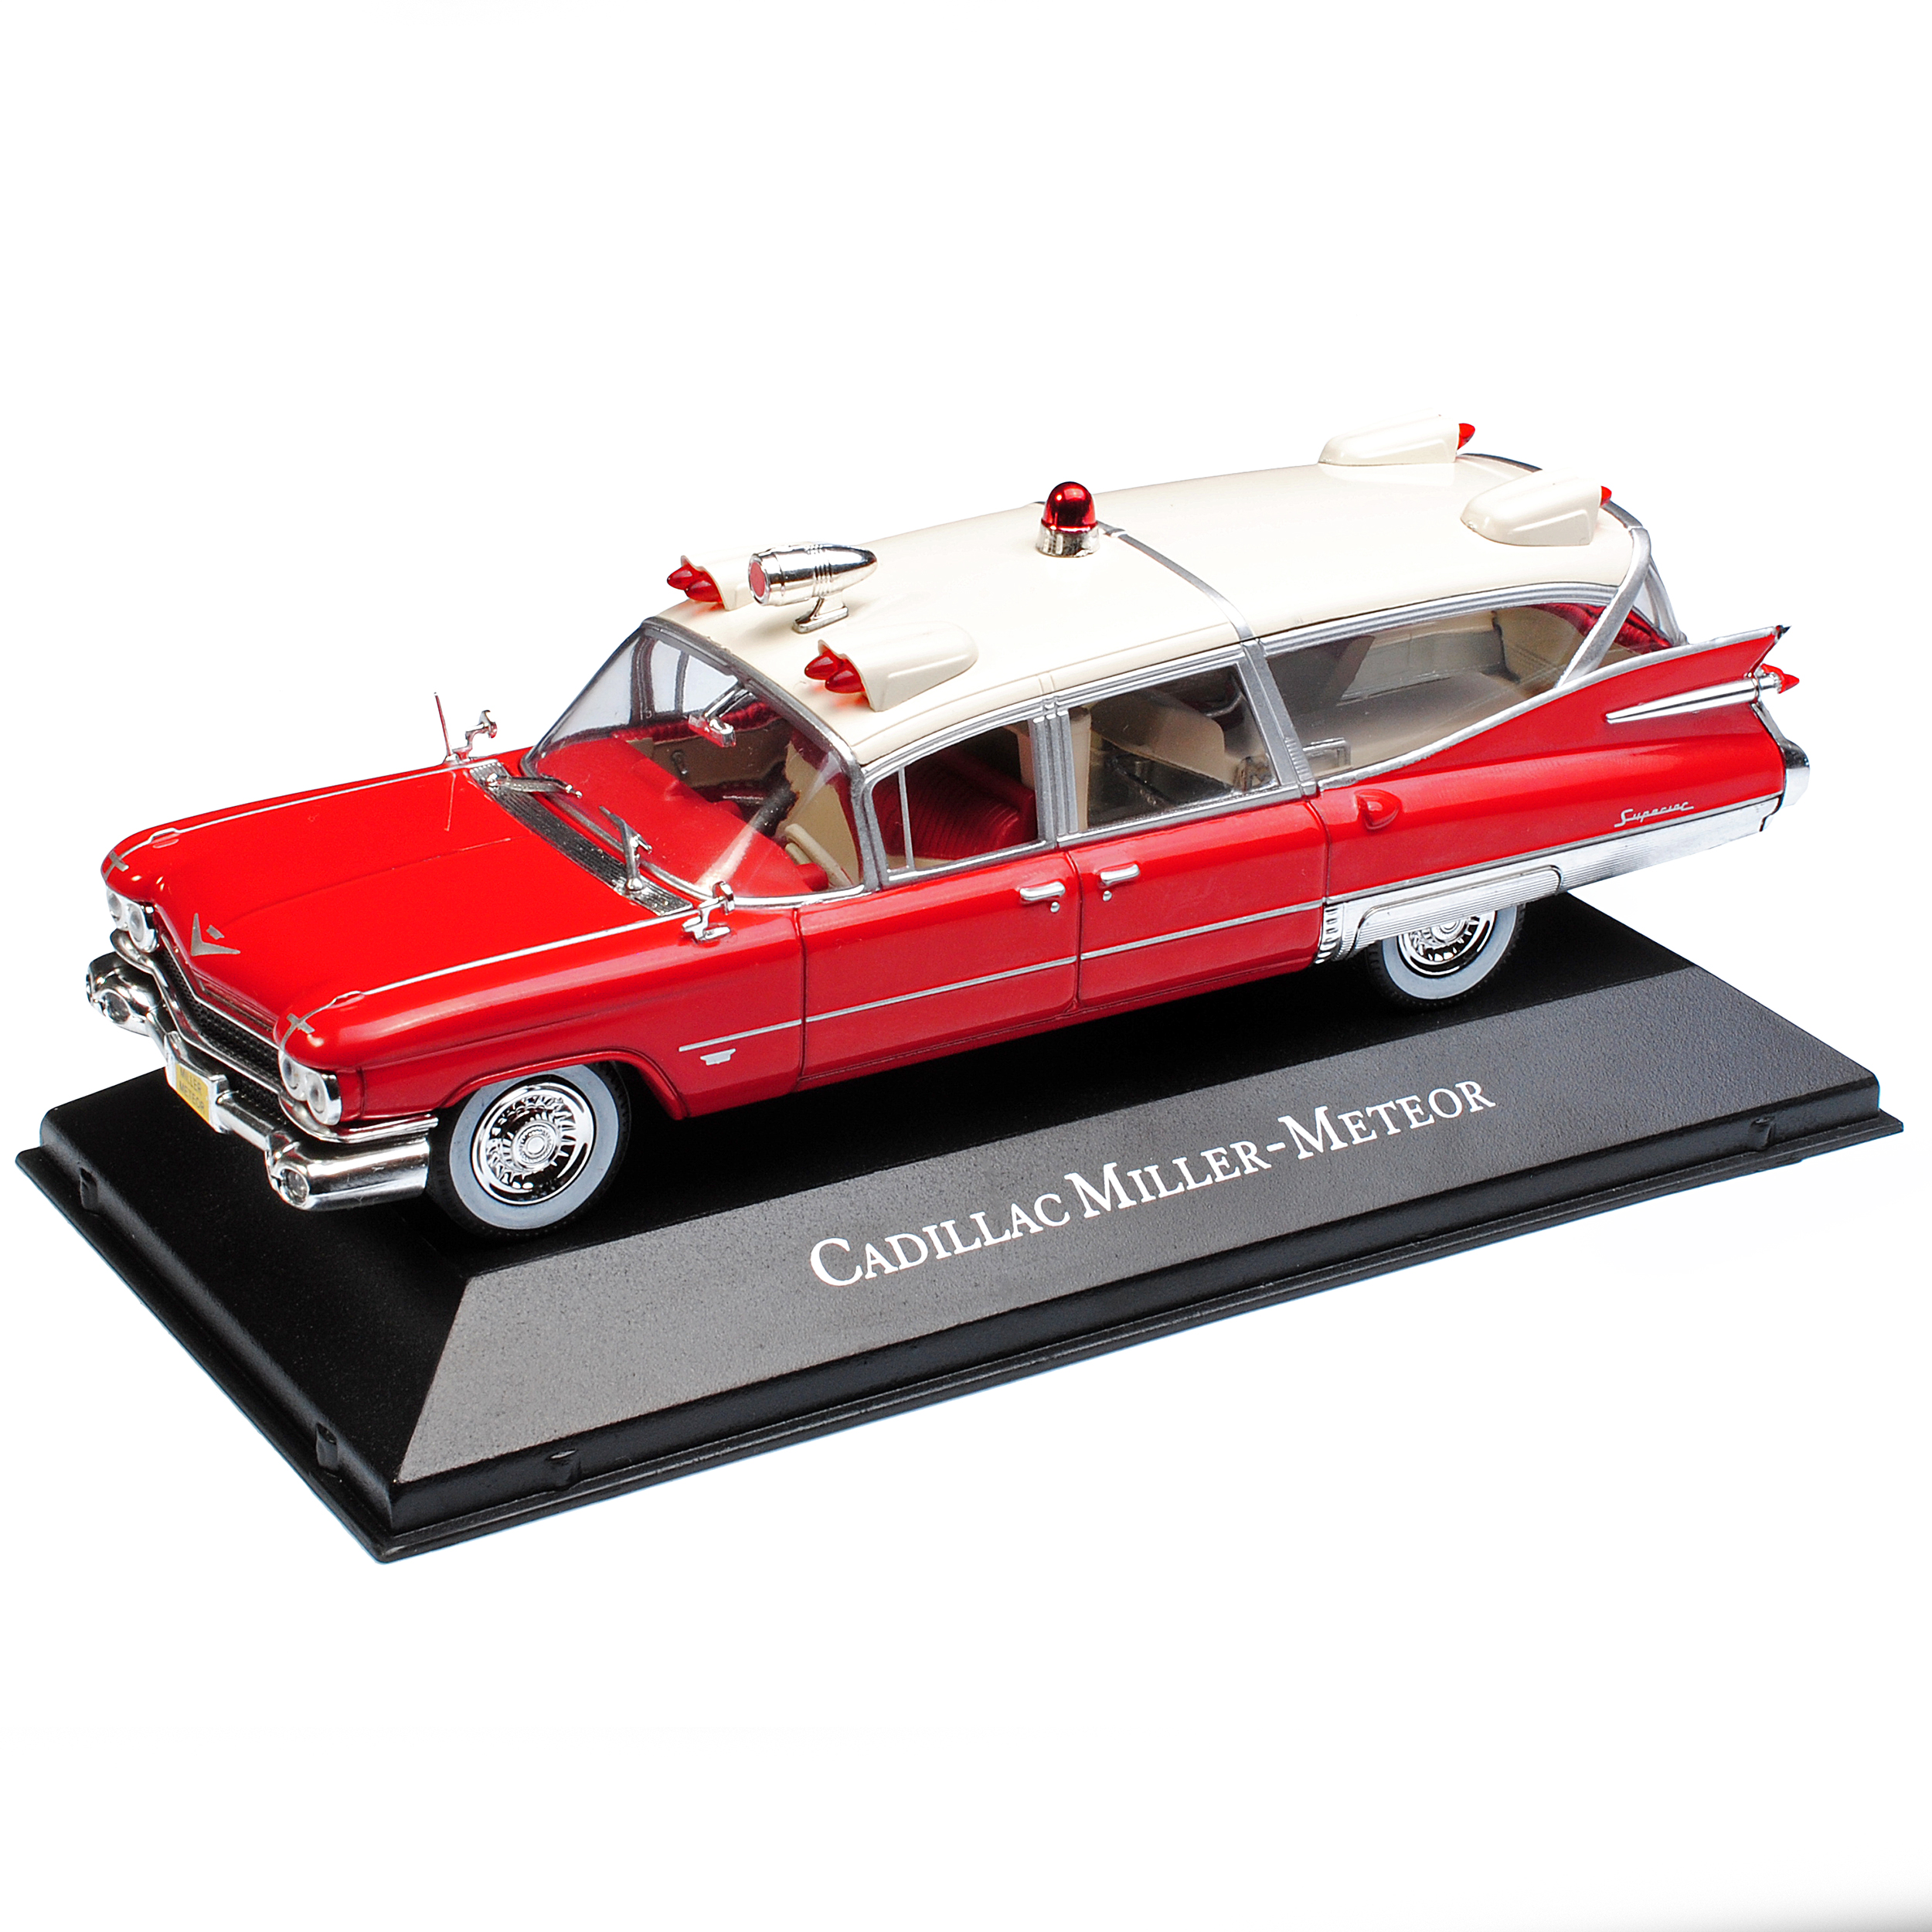 Ambulancia Cadillac Miller Meteor rojo blanco Atlas 1:43 modelo de coche con o sin...